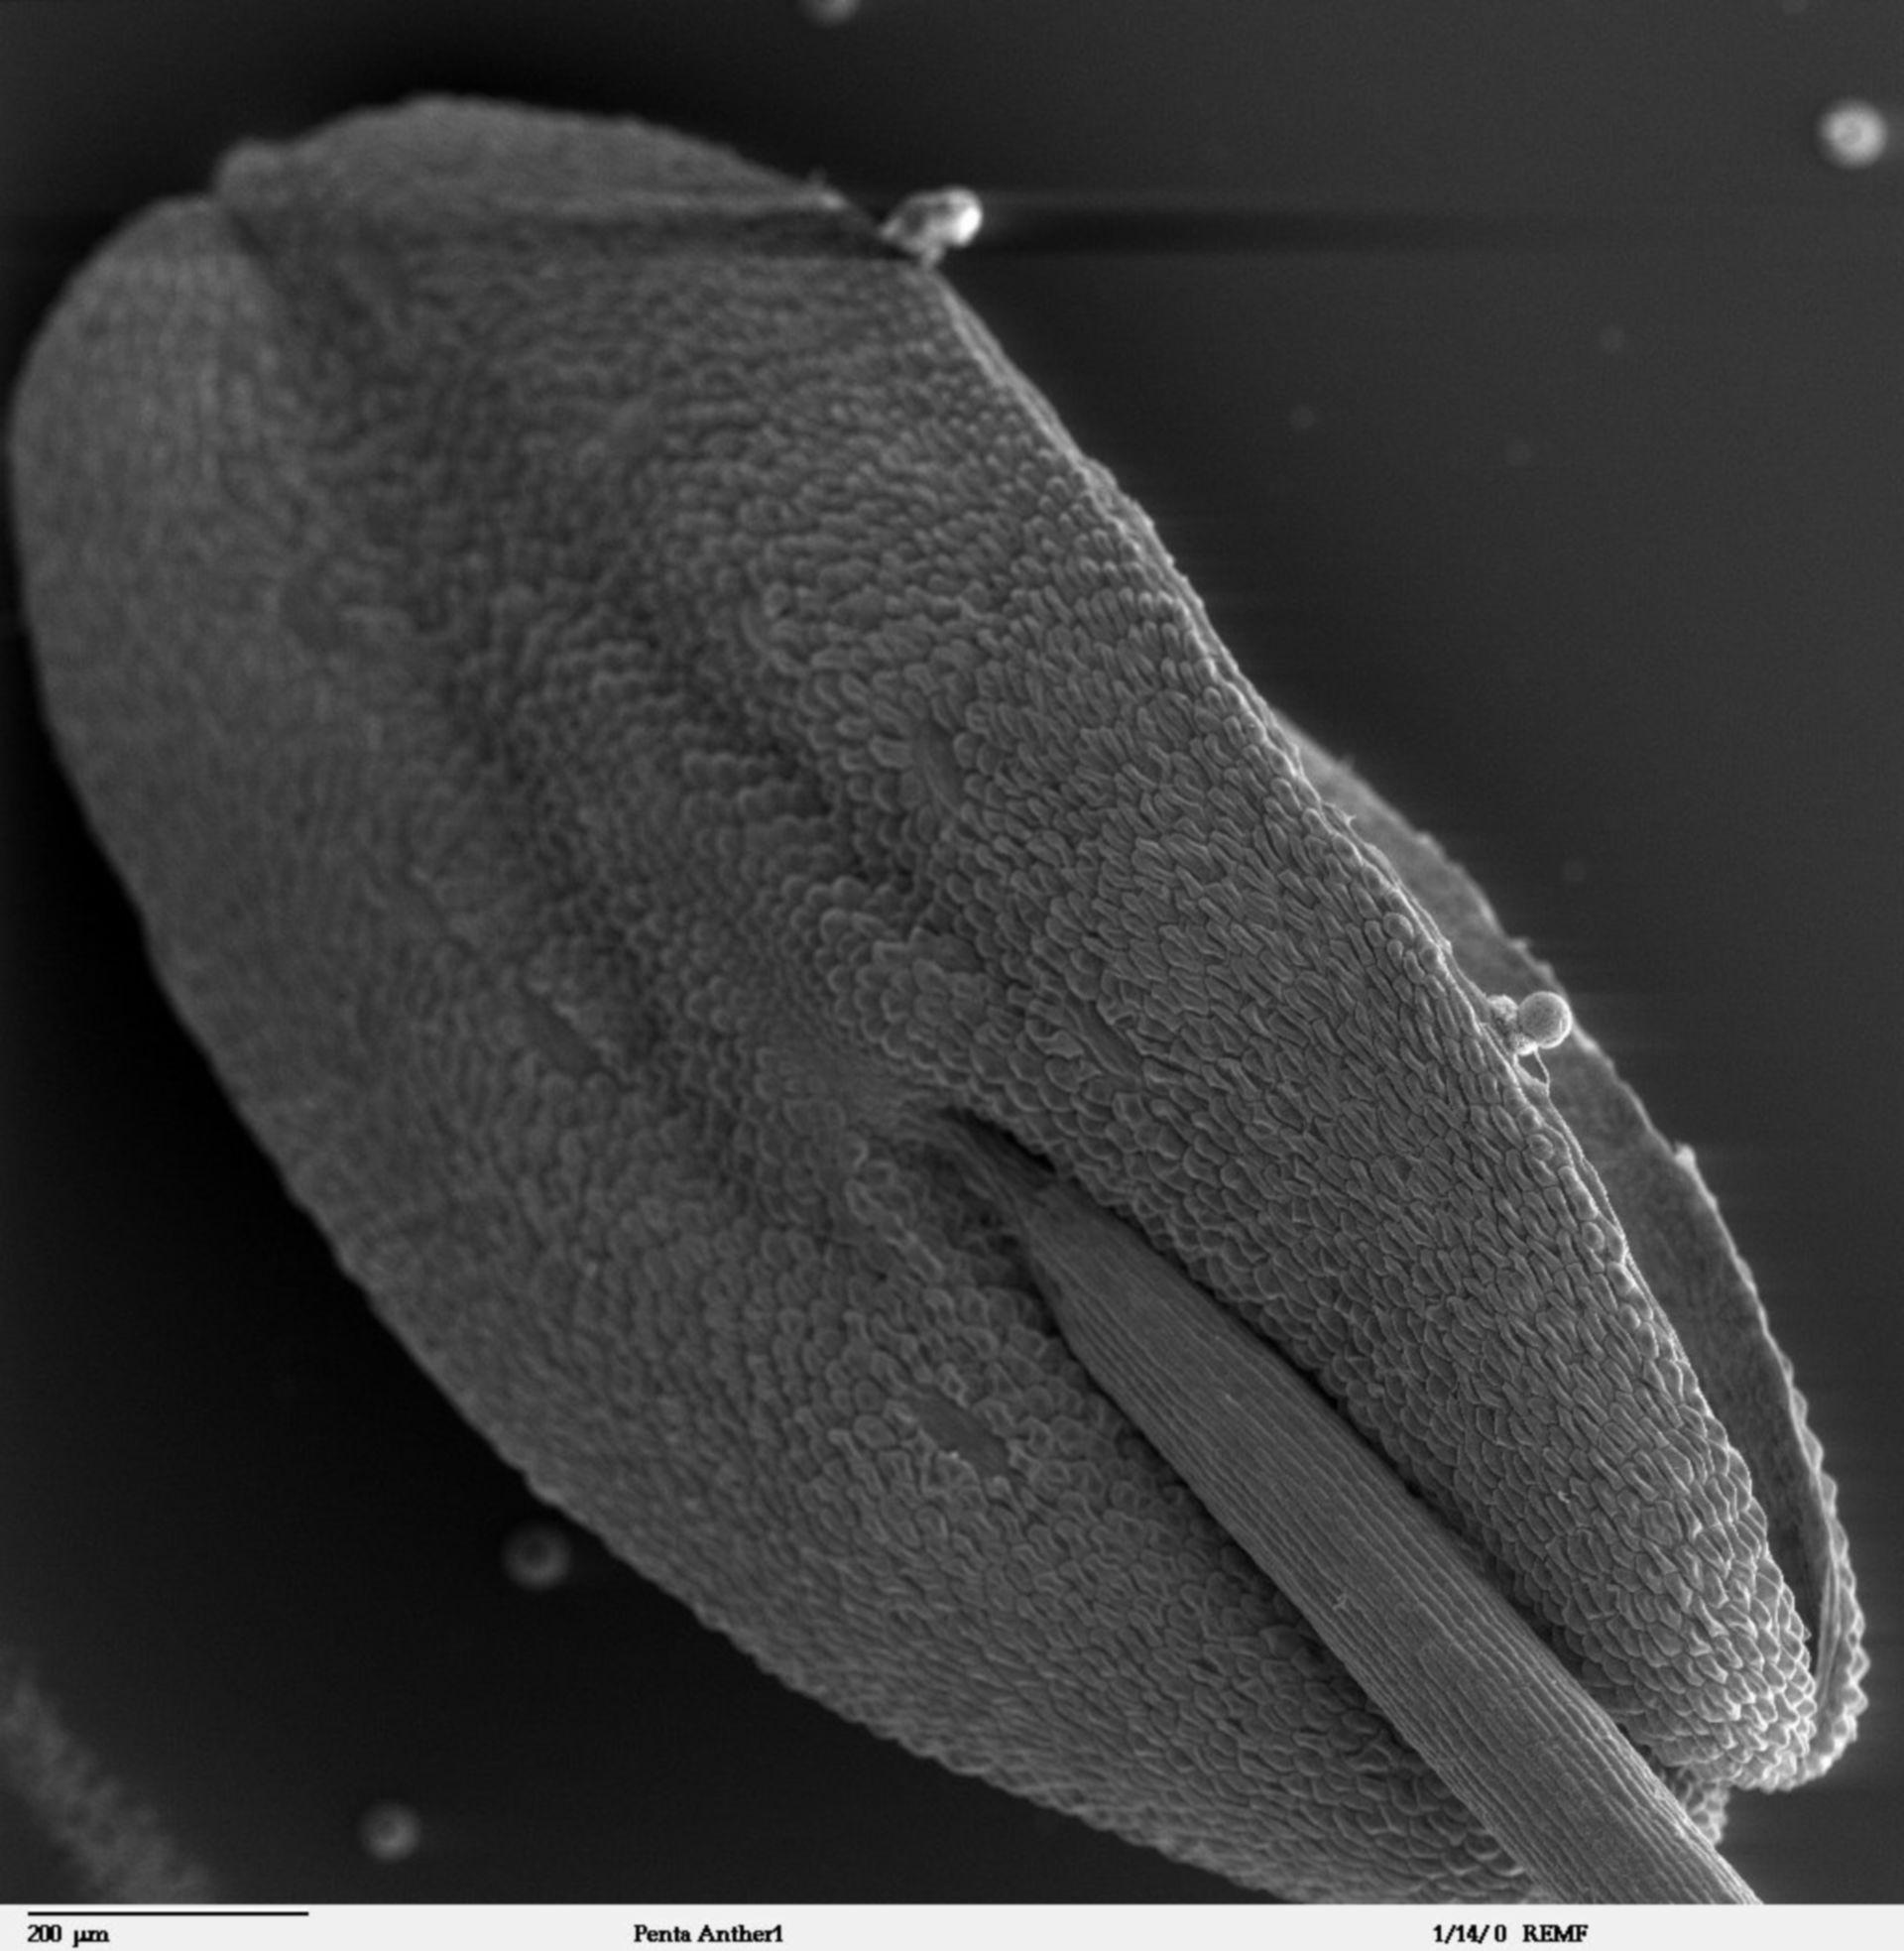 Pentas lanceolata (Cell surface) - CIL:41306